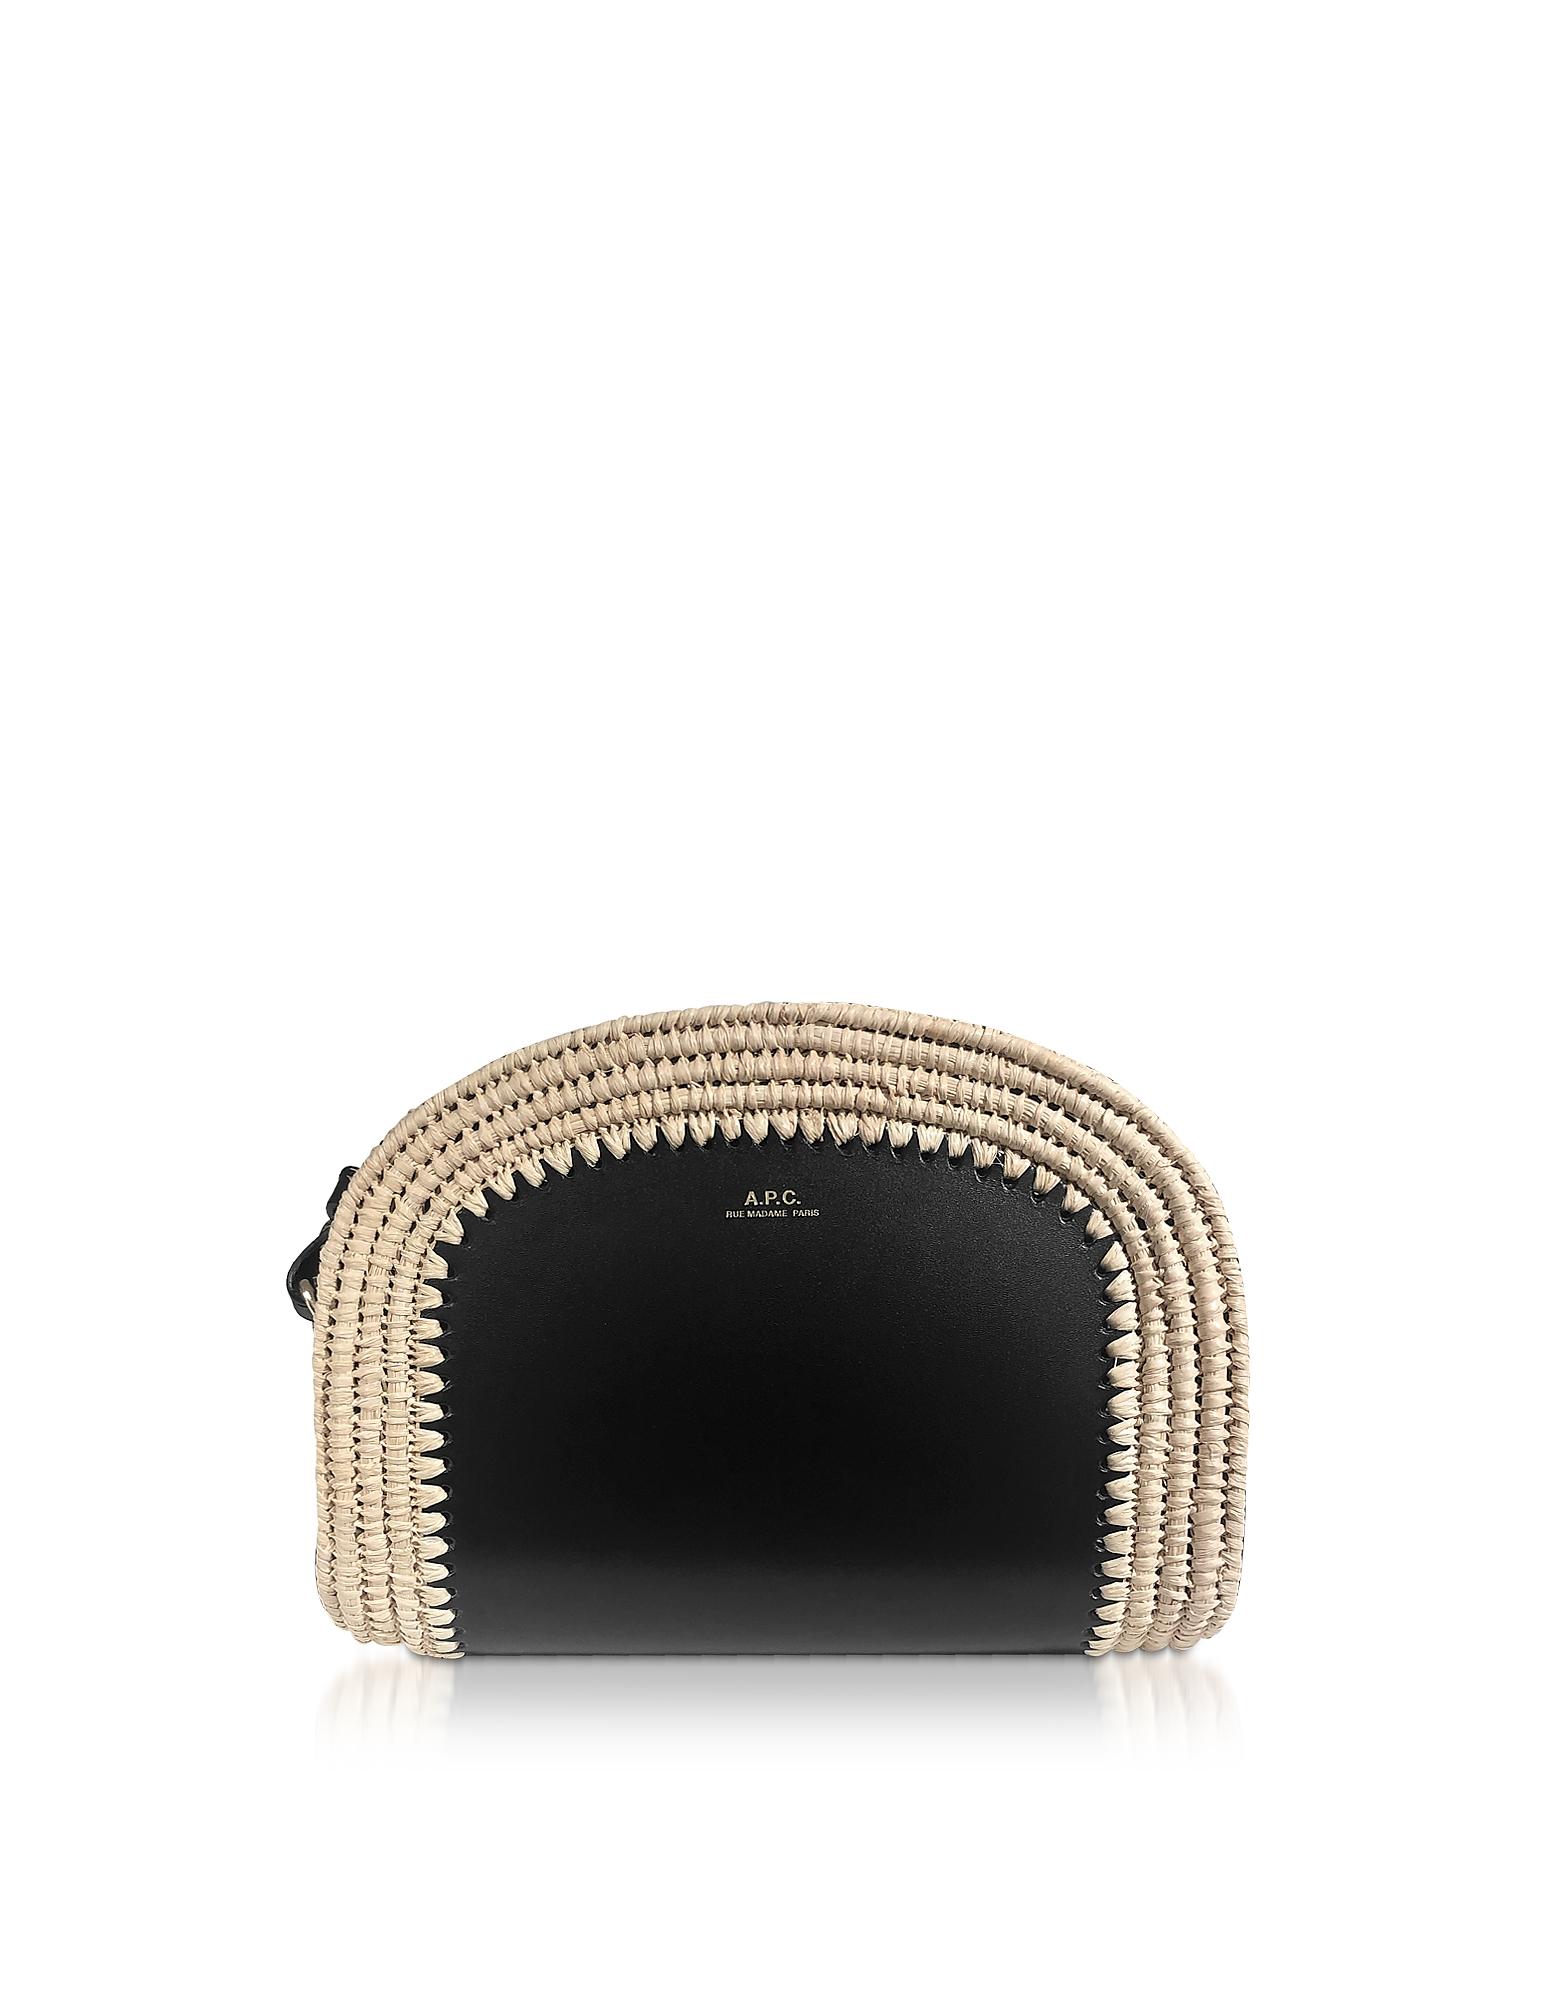 A.P.C. Designer Handbags, Woven Straw & Black Leather Mini Demi-Lune Crossbody Bag